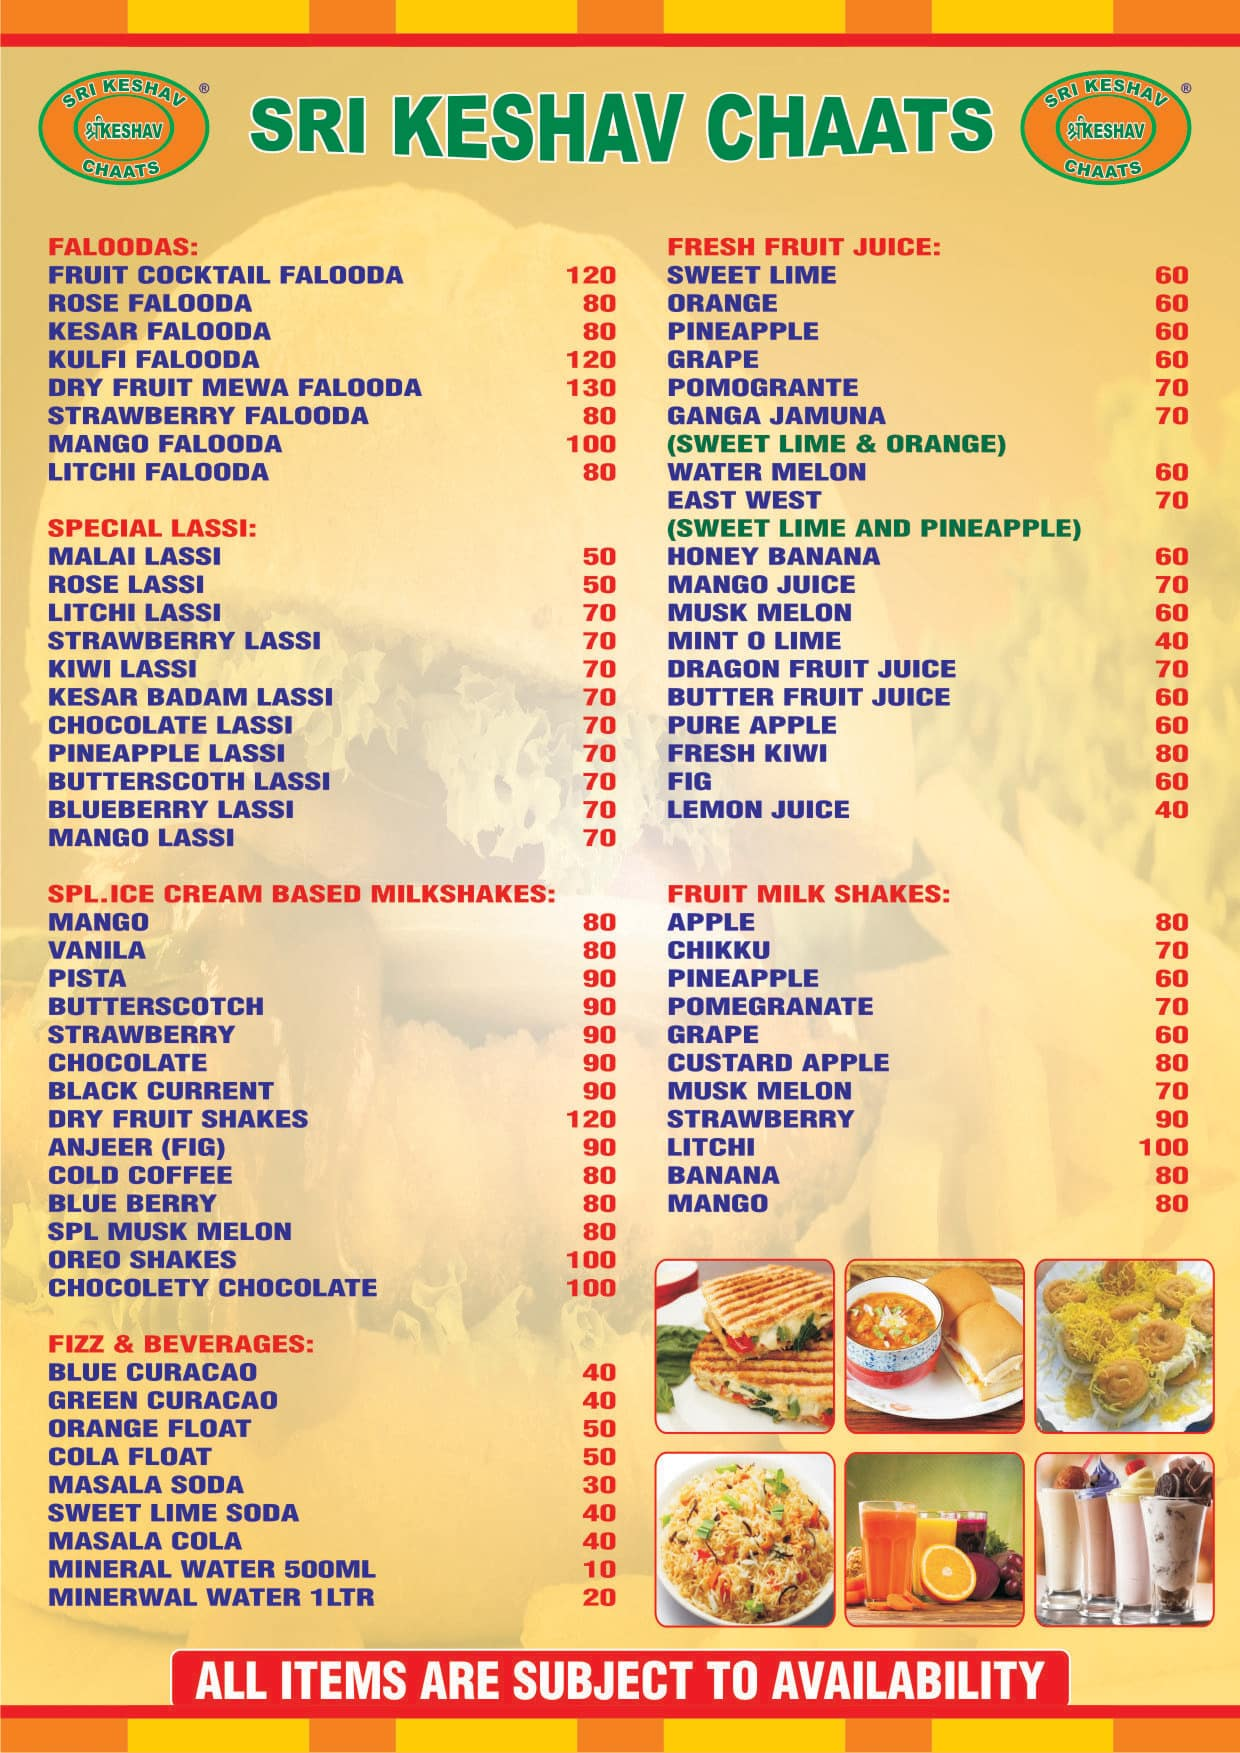 Sri Keshav Chats Menu